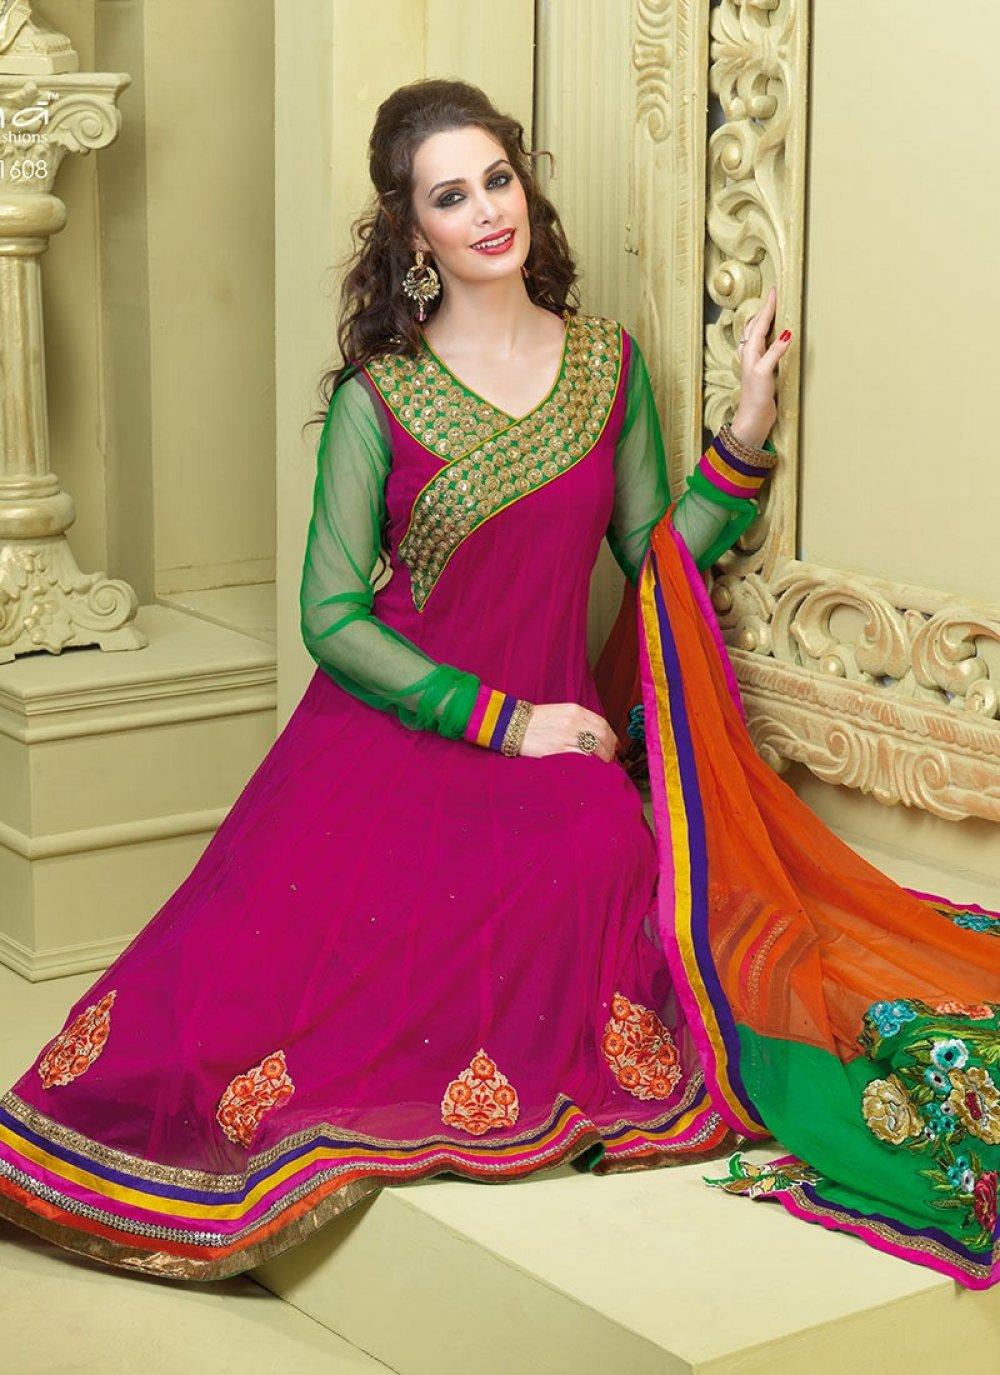 Splendorous Aloe Vera Green & Deep Pink Salwar Kameez